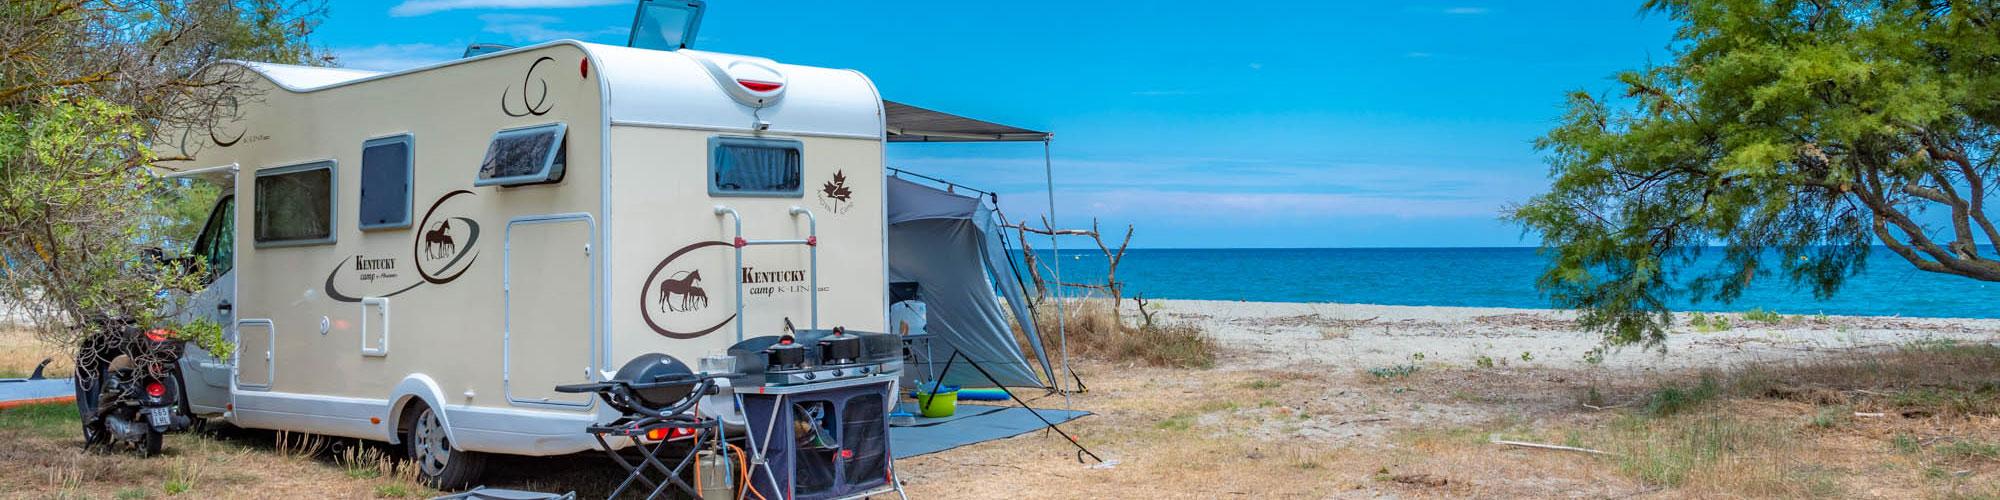 Wohnmobil auf Korsika